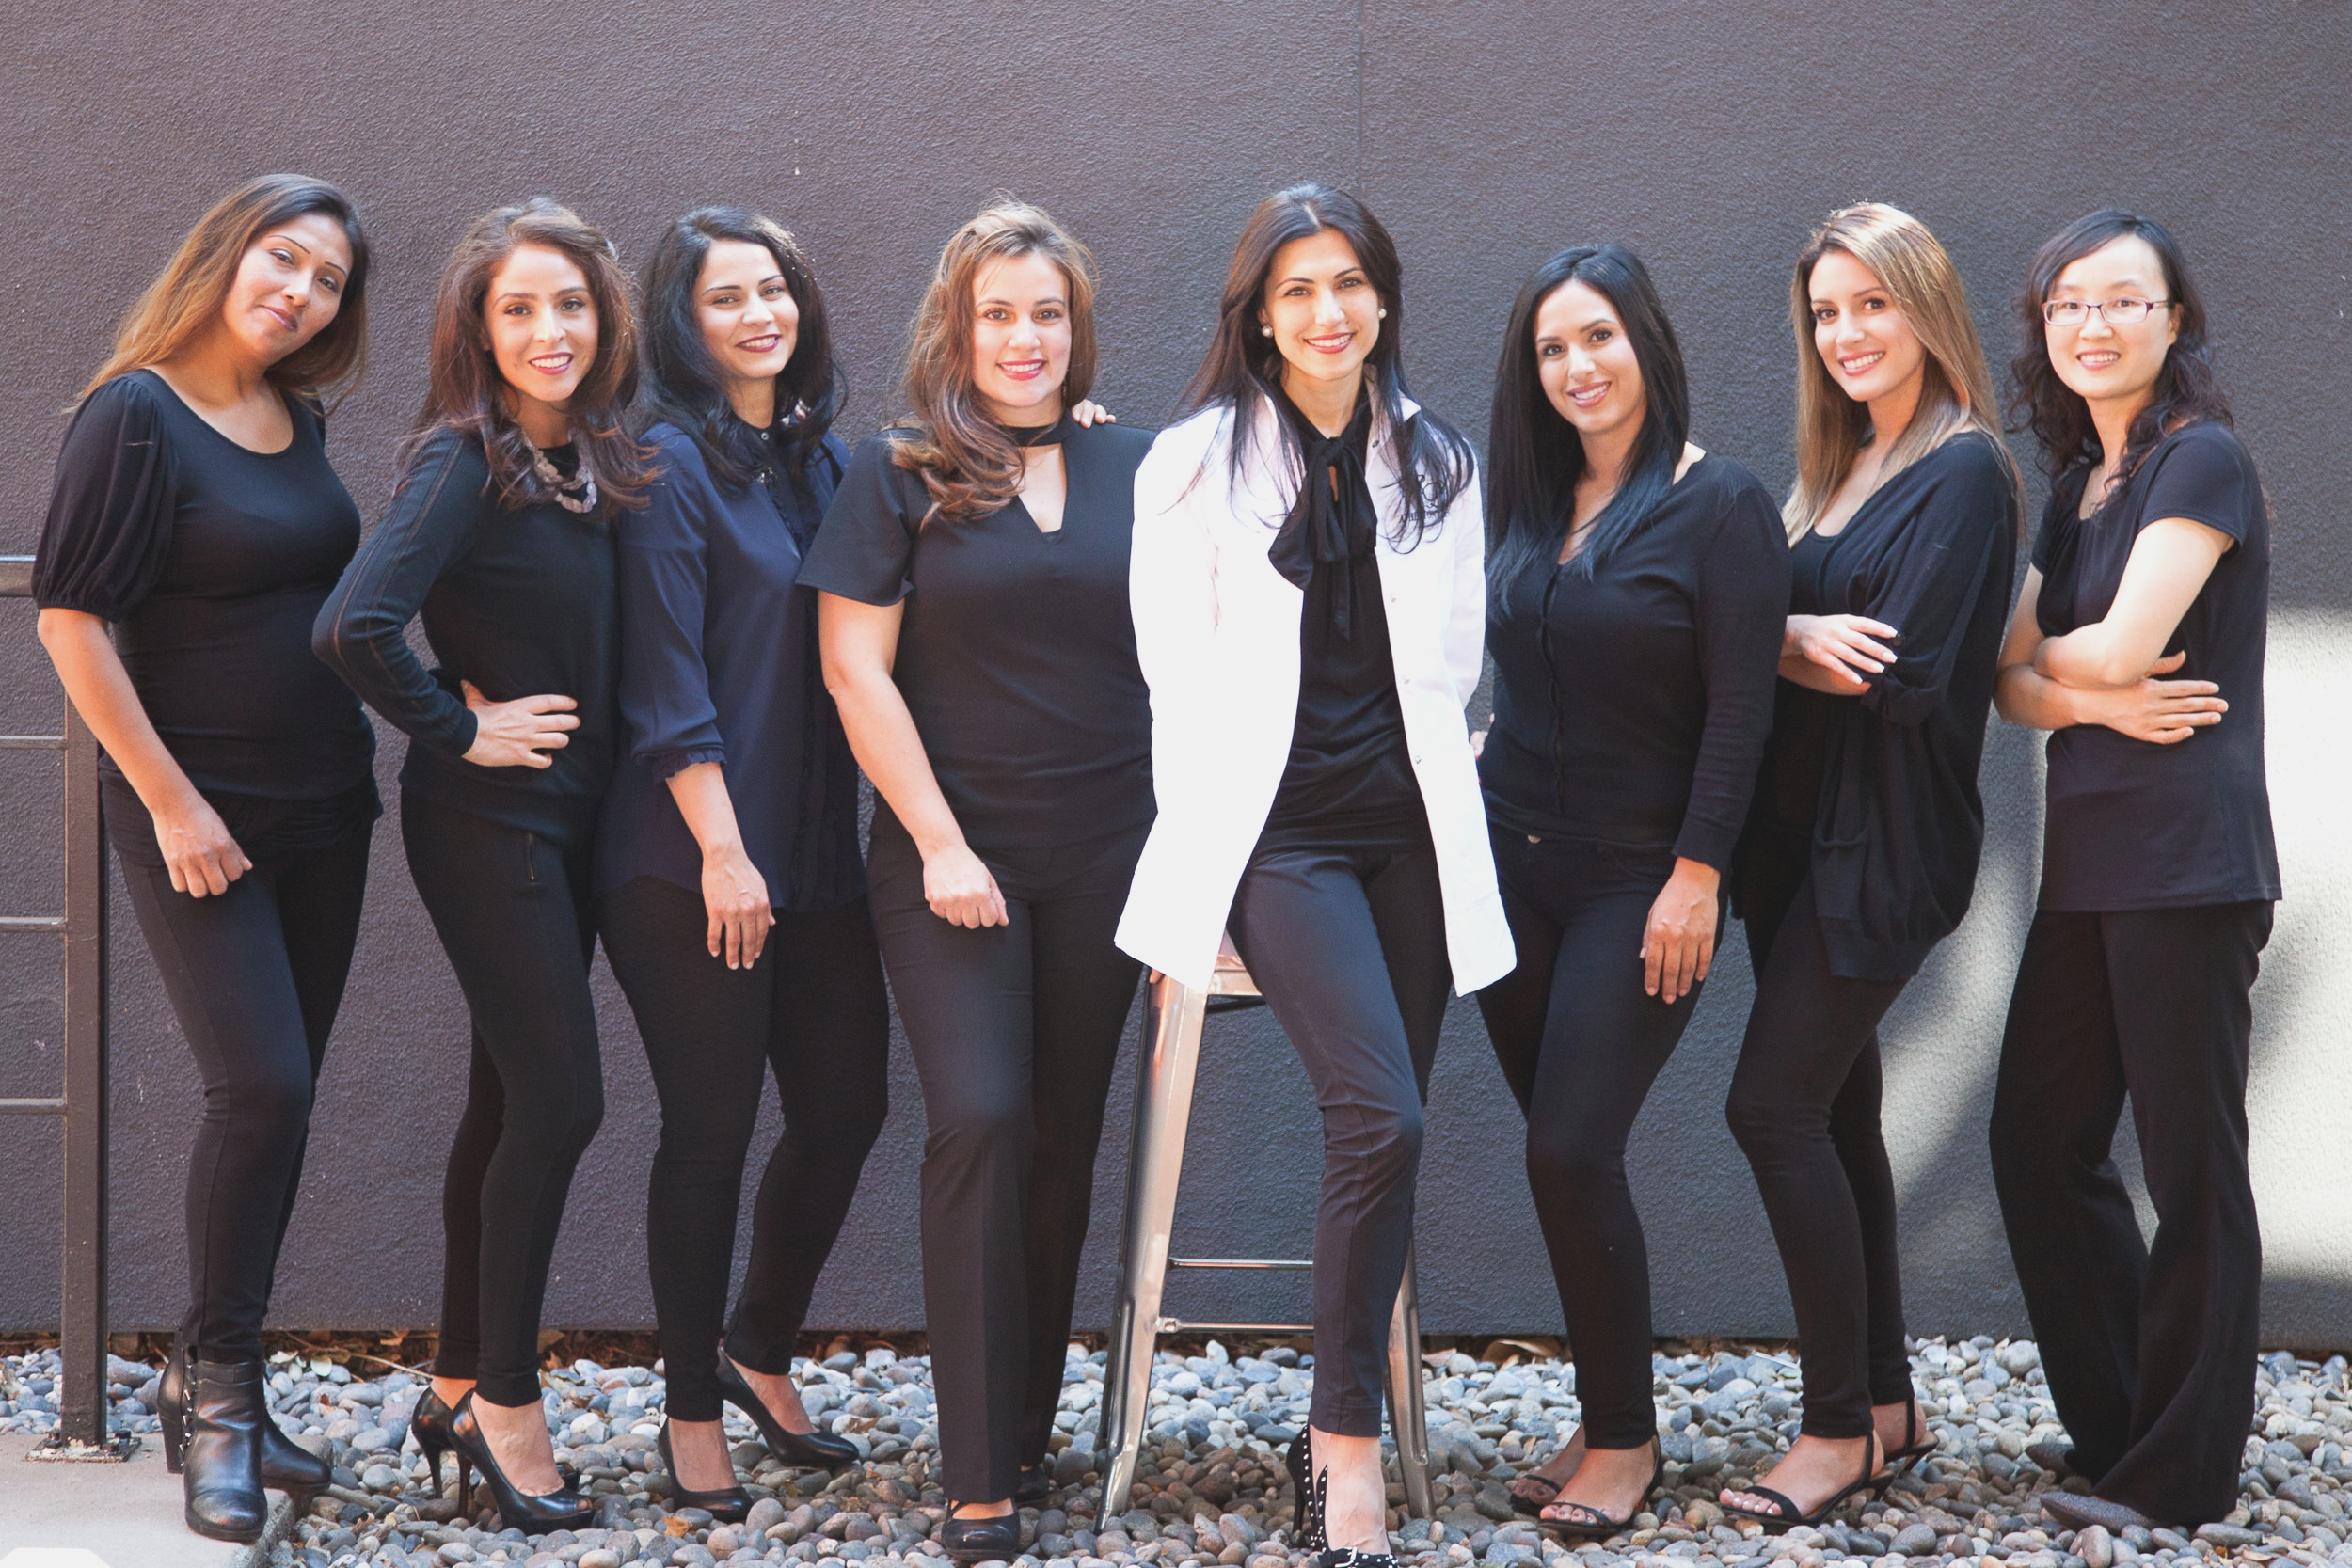 Left to Right: Katty, Aurora, Ghazaleh, Catalina, Dr. Doroodian, Cynthia, Betzy, Helen.